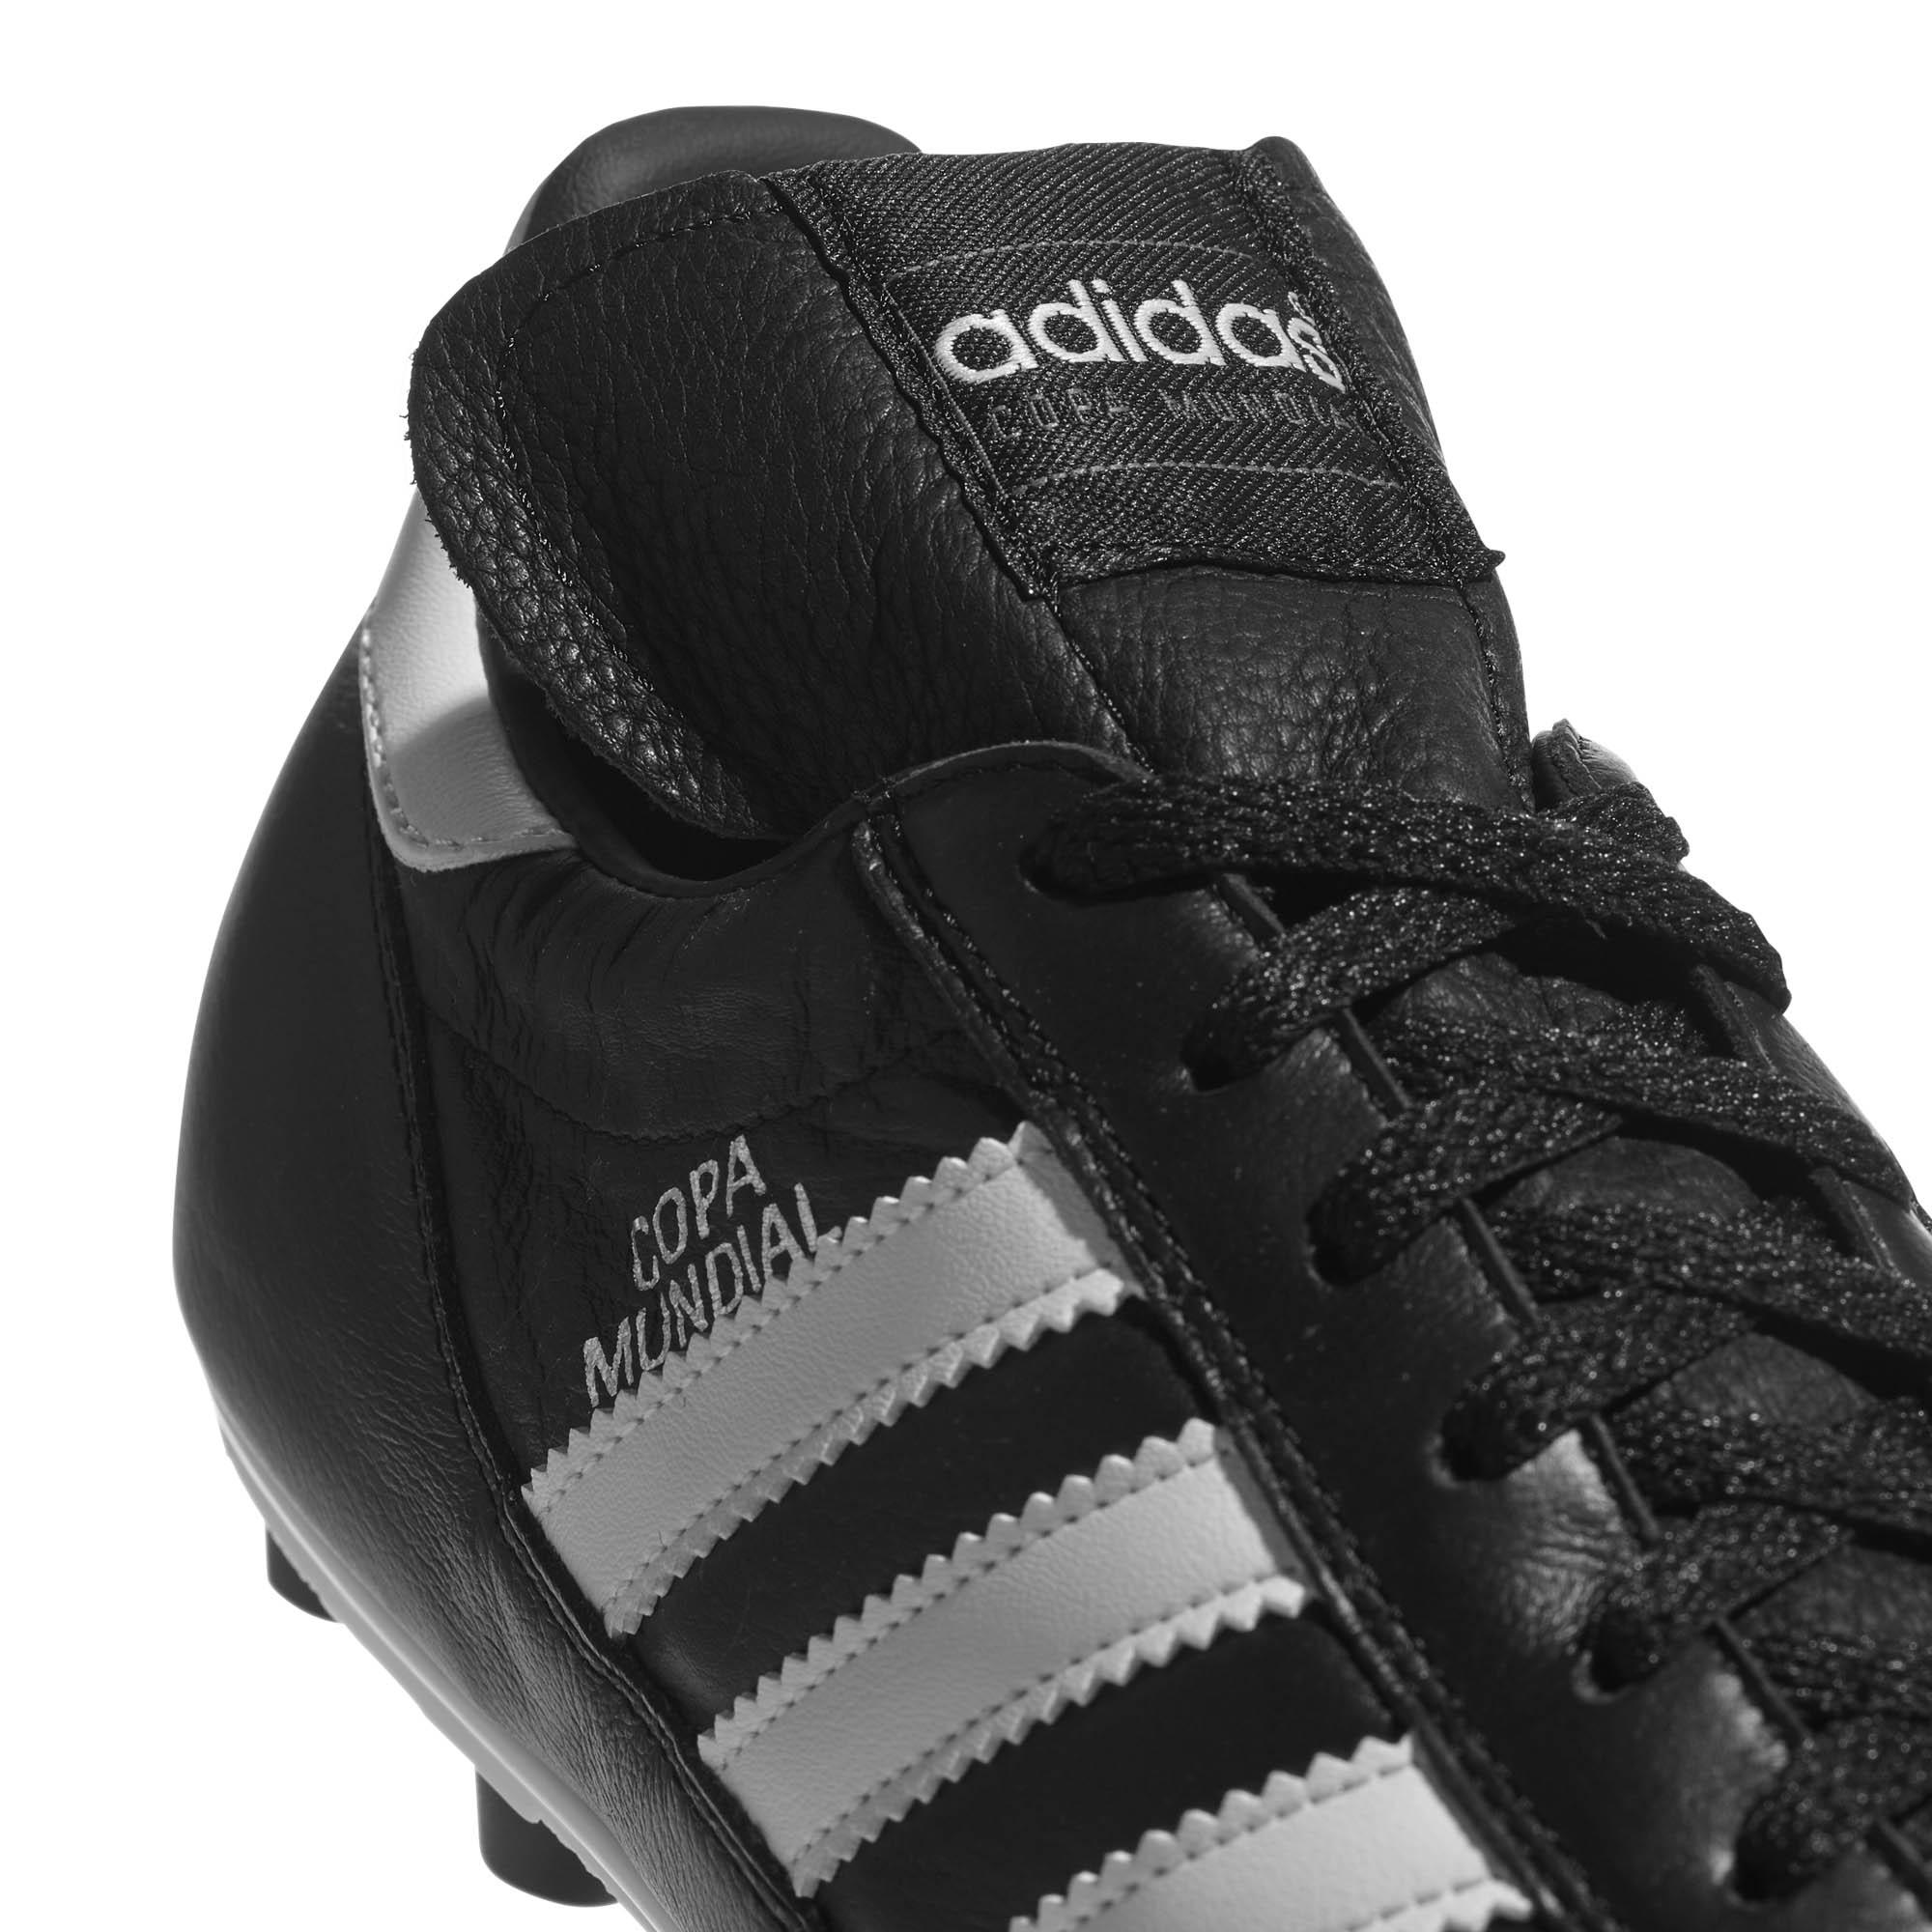 miniature 7 - Adidas-Copa-Mundial-FG-Firm-Ground-pour-homme-Football-Boot-Noir-Blanc